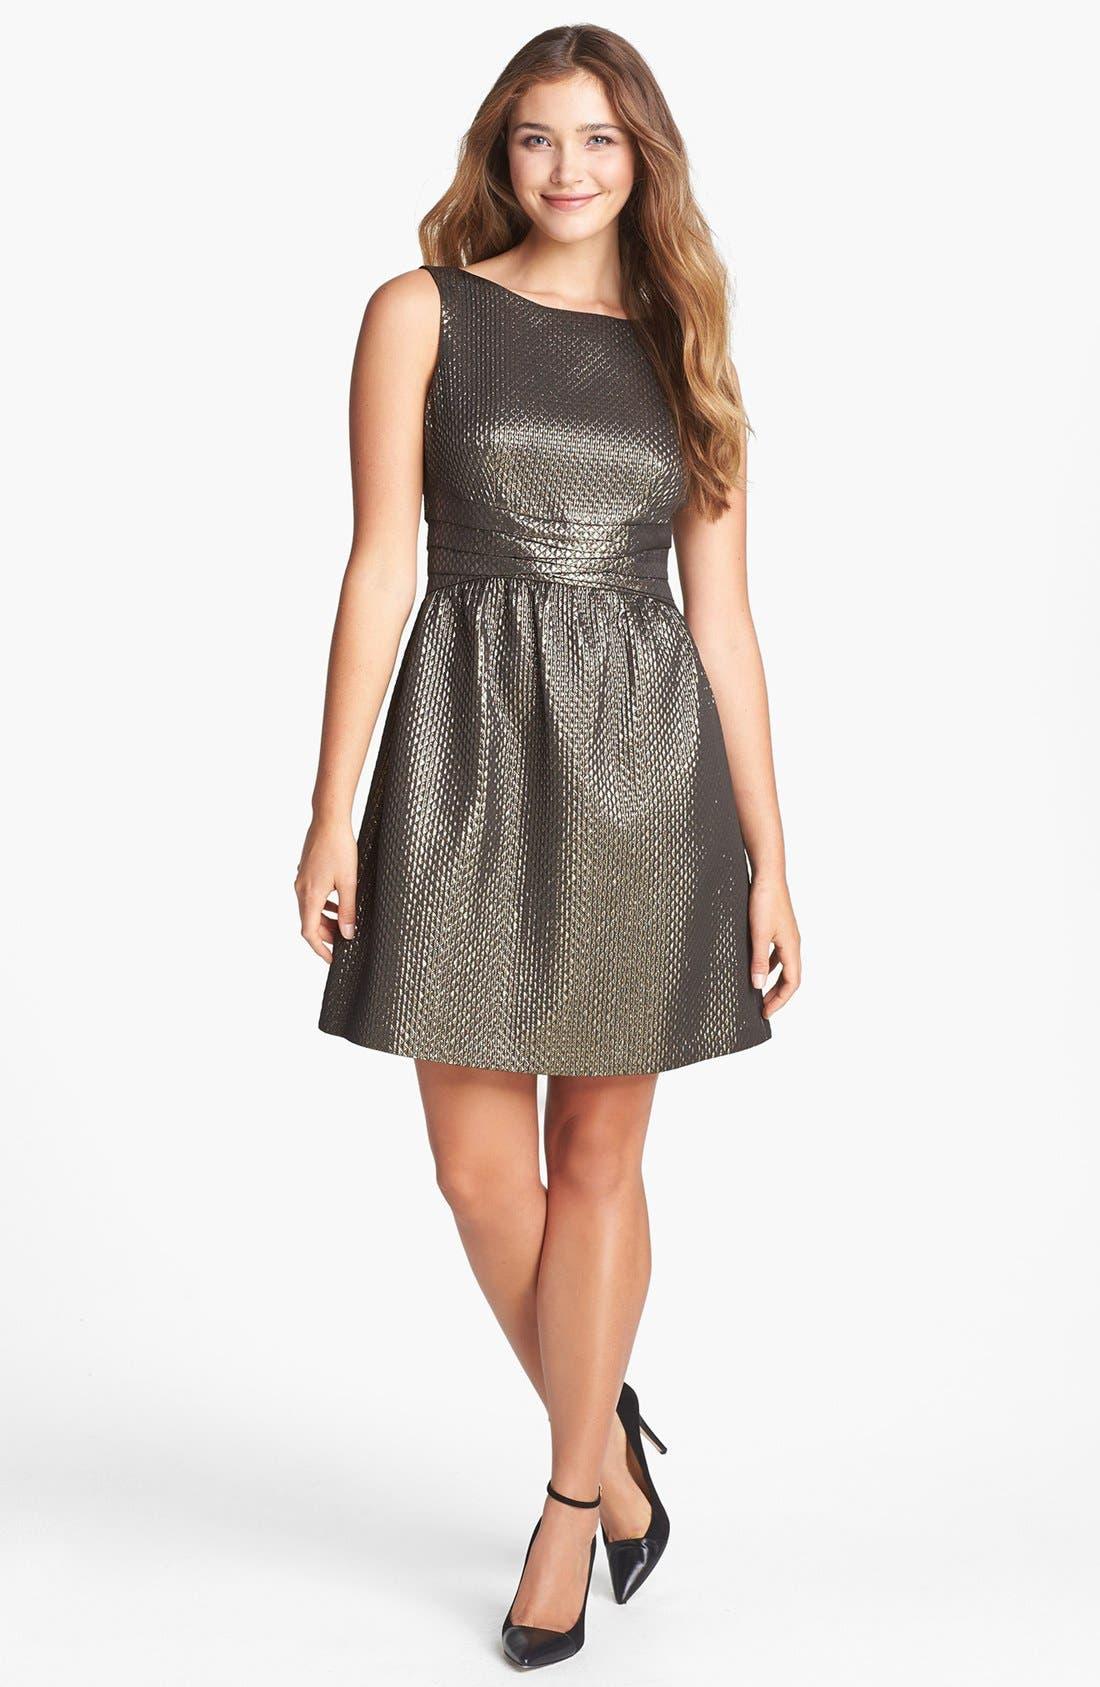 Alternate Image 1 Selected - Ivy & Blu Metallic Jacquard Fit & Flare Dress